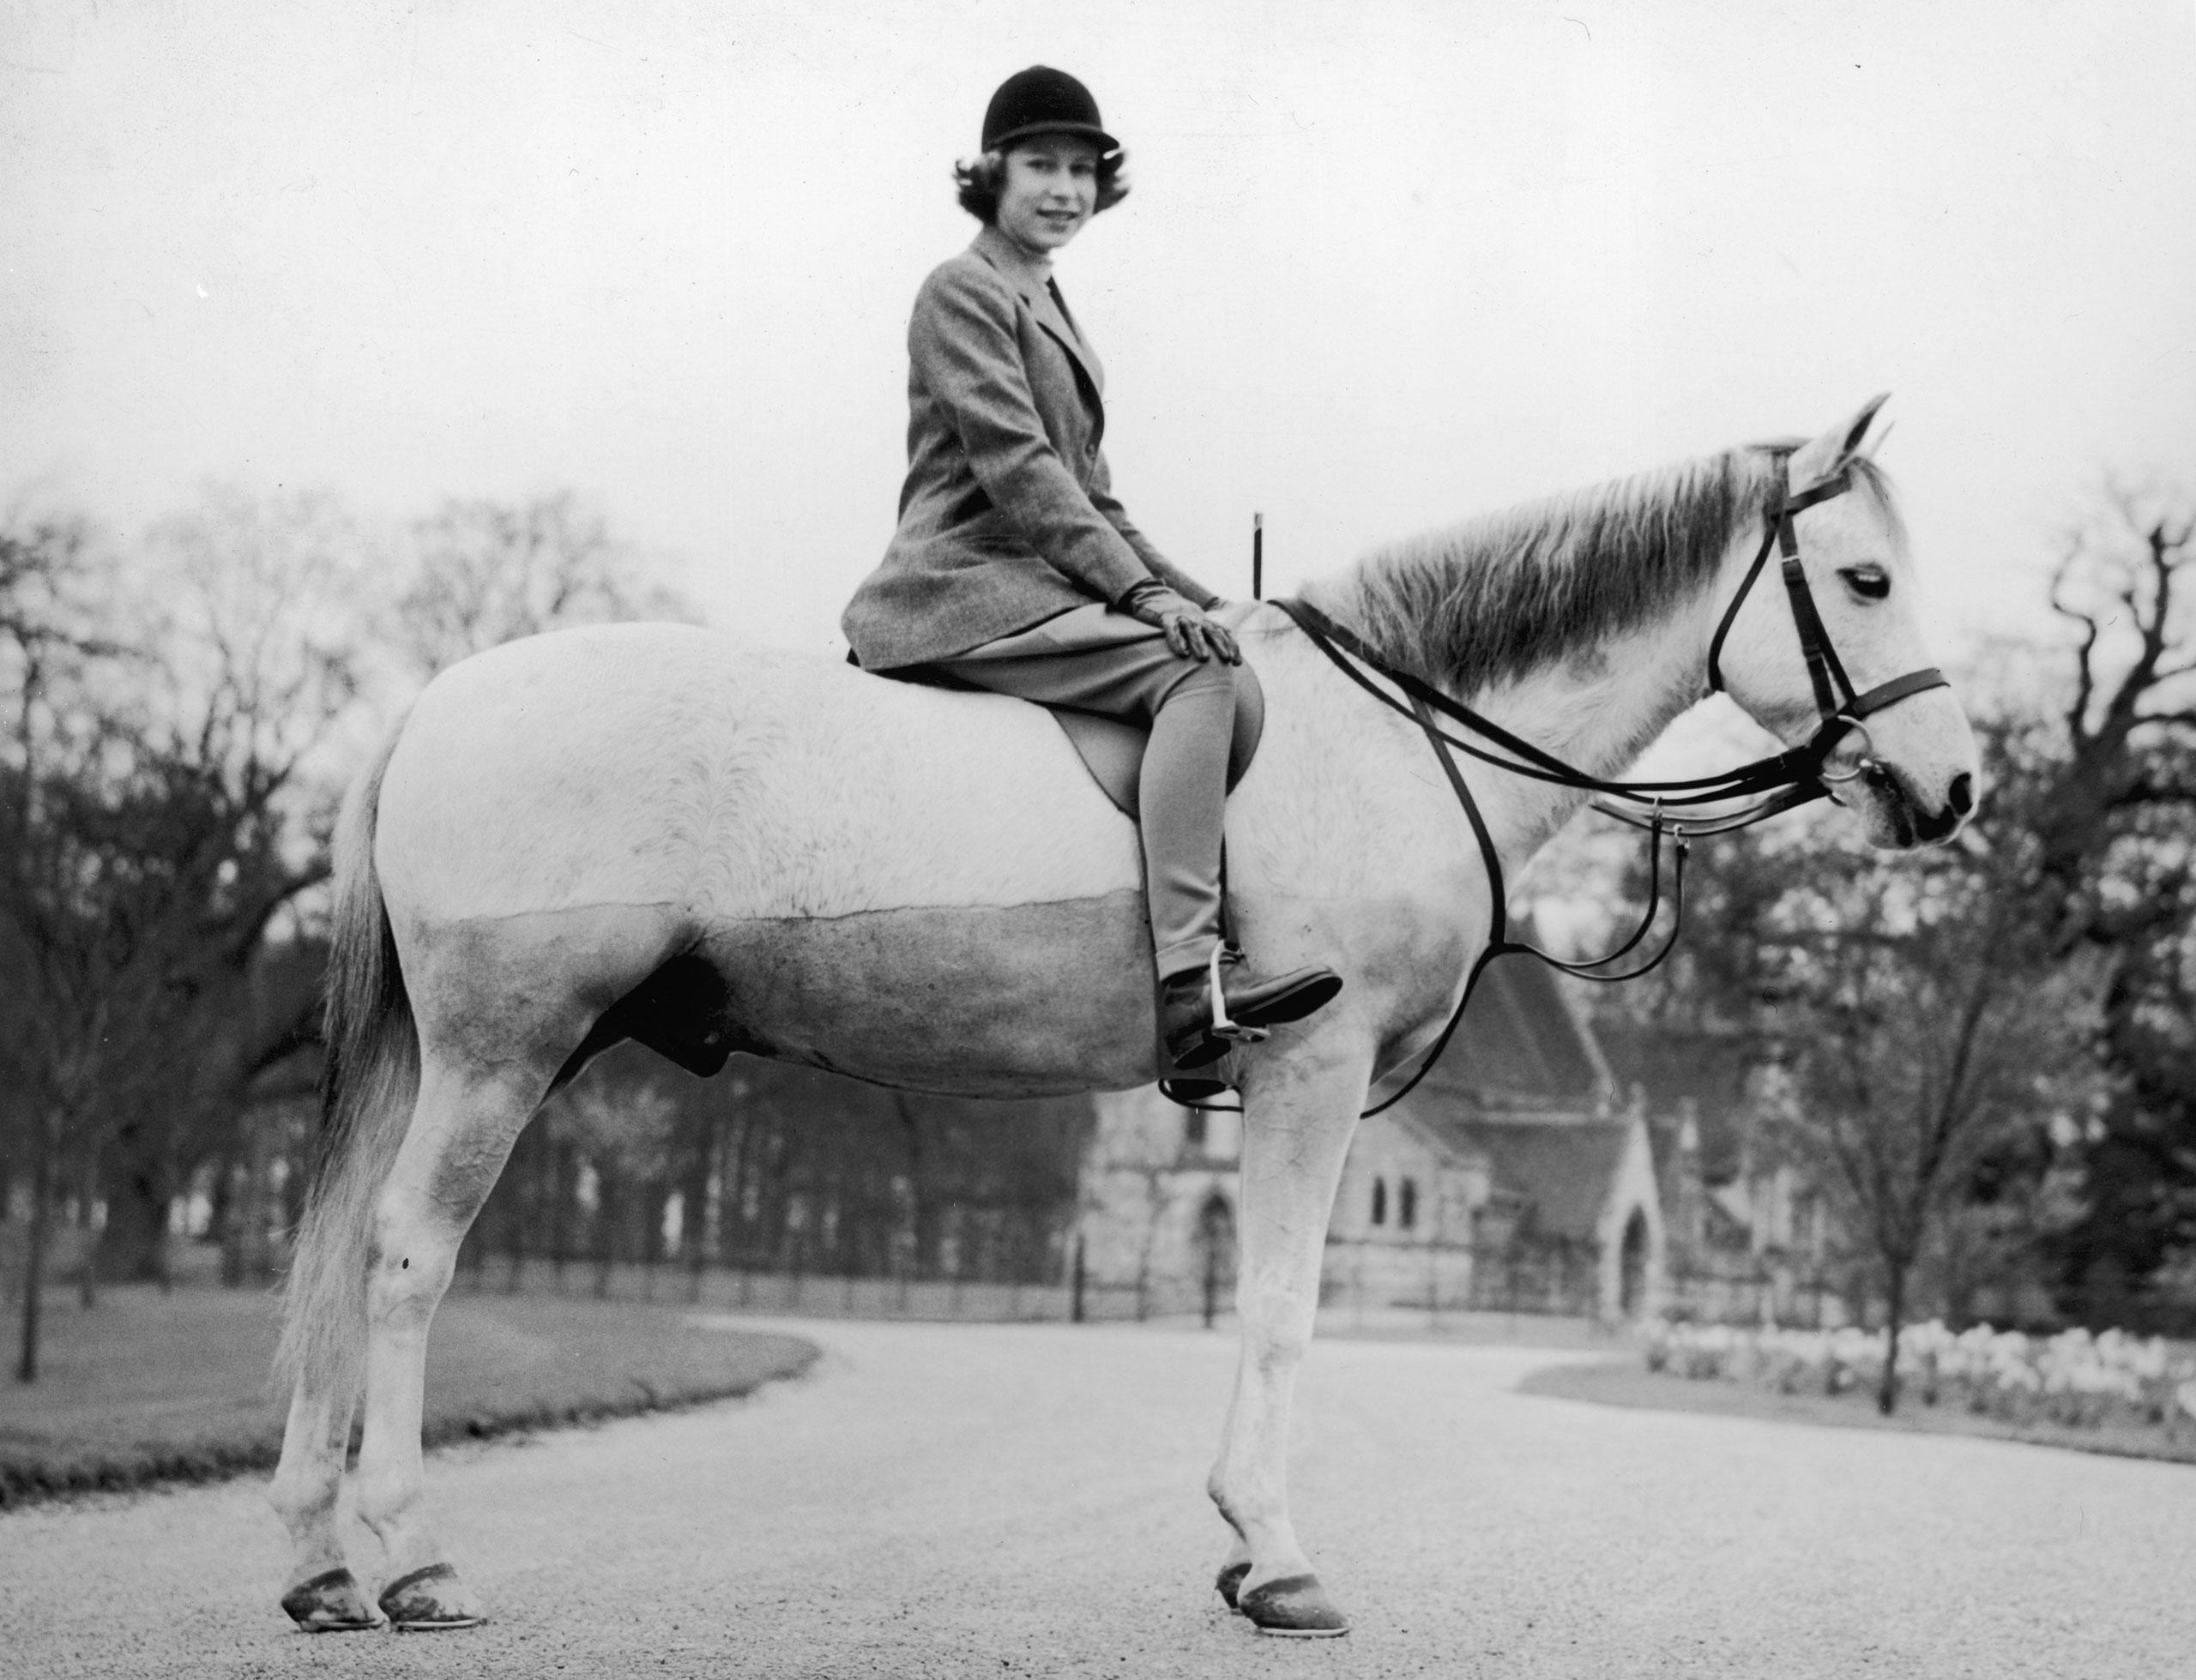 Princess Elizabeth out riding at the Royal Lodge, Windsor. April 1940.